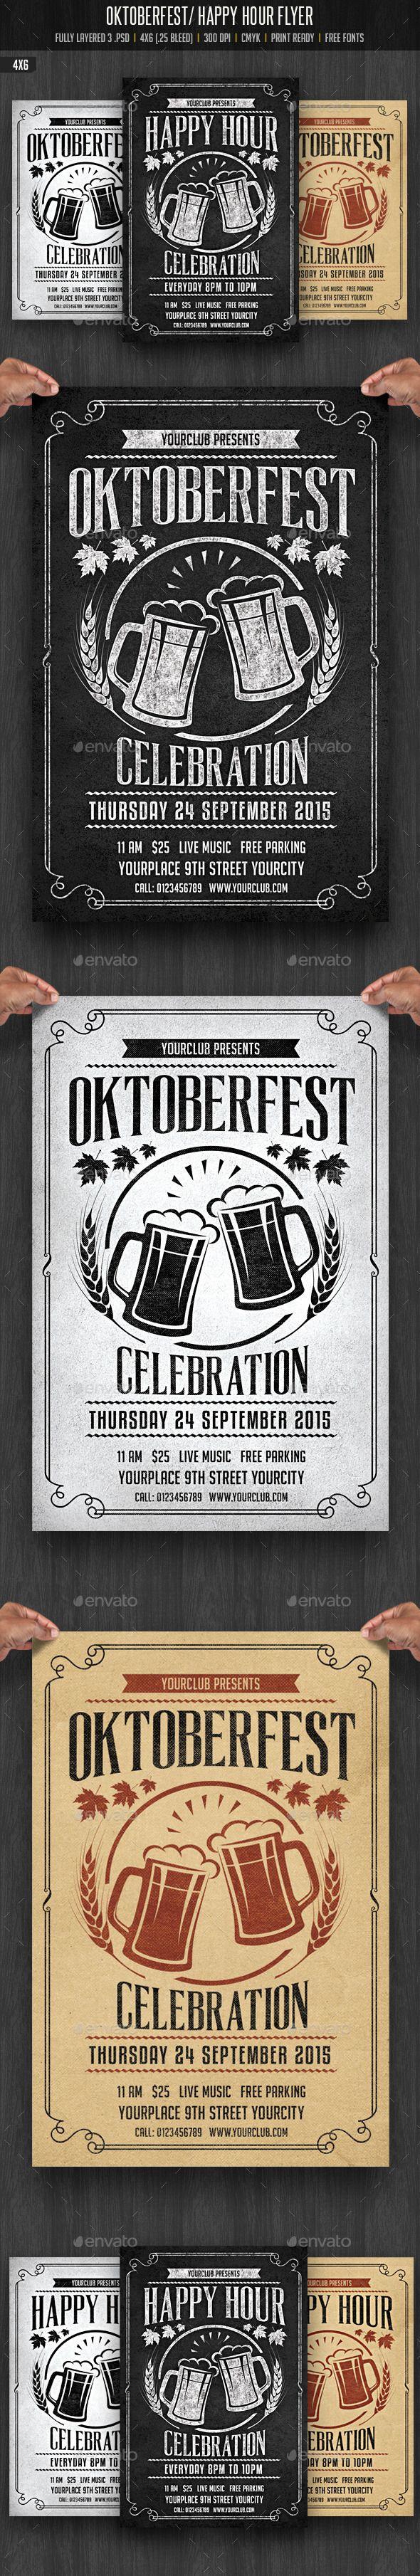 Oktobefest / Happy Hour Flyer Template #design Download: http://graphicriver.net/item/oktobefest-happy-hour-flyer/12755962?ref=ksioks